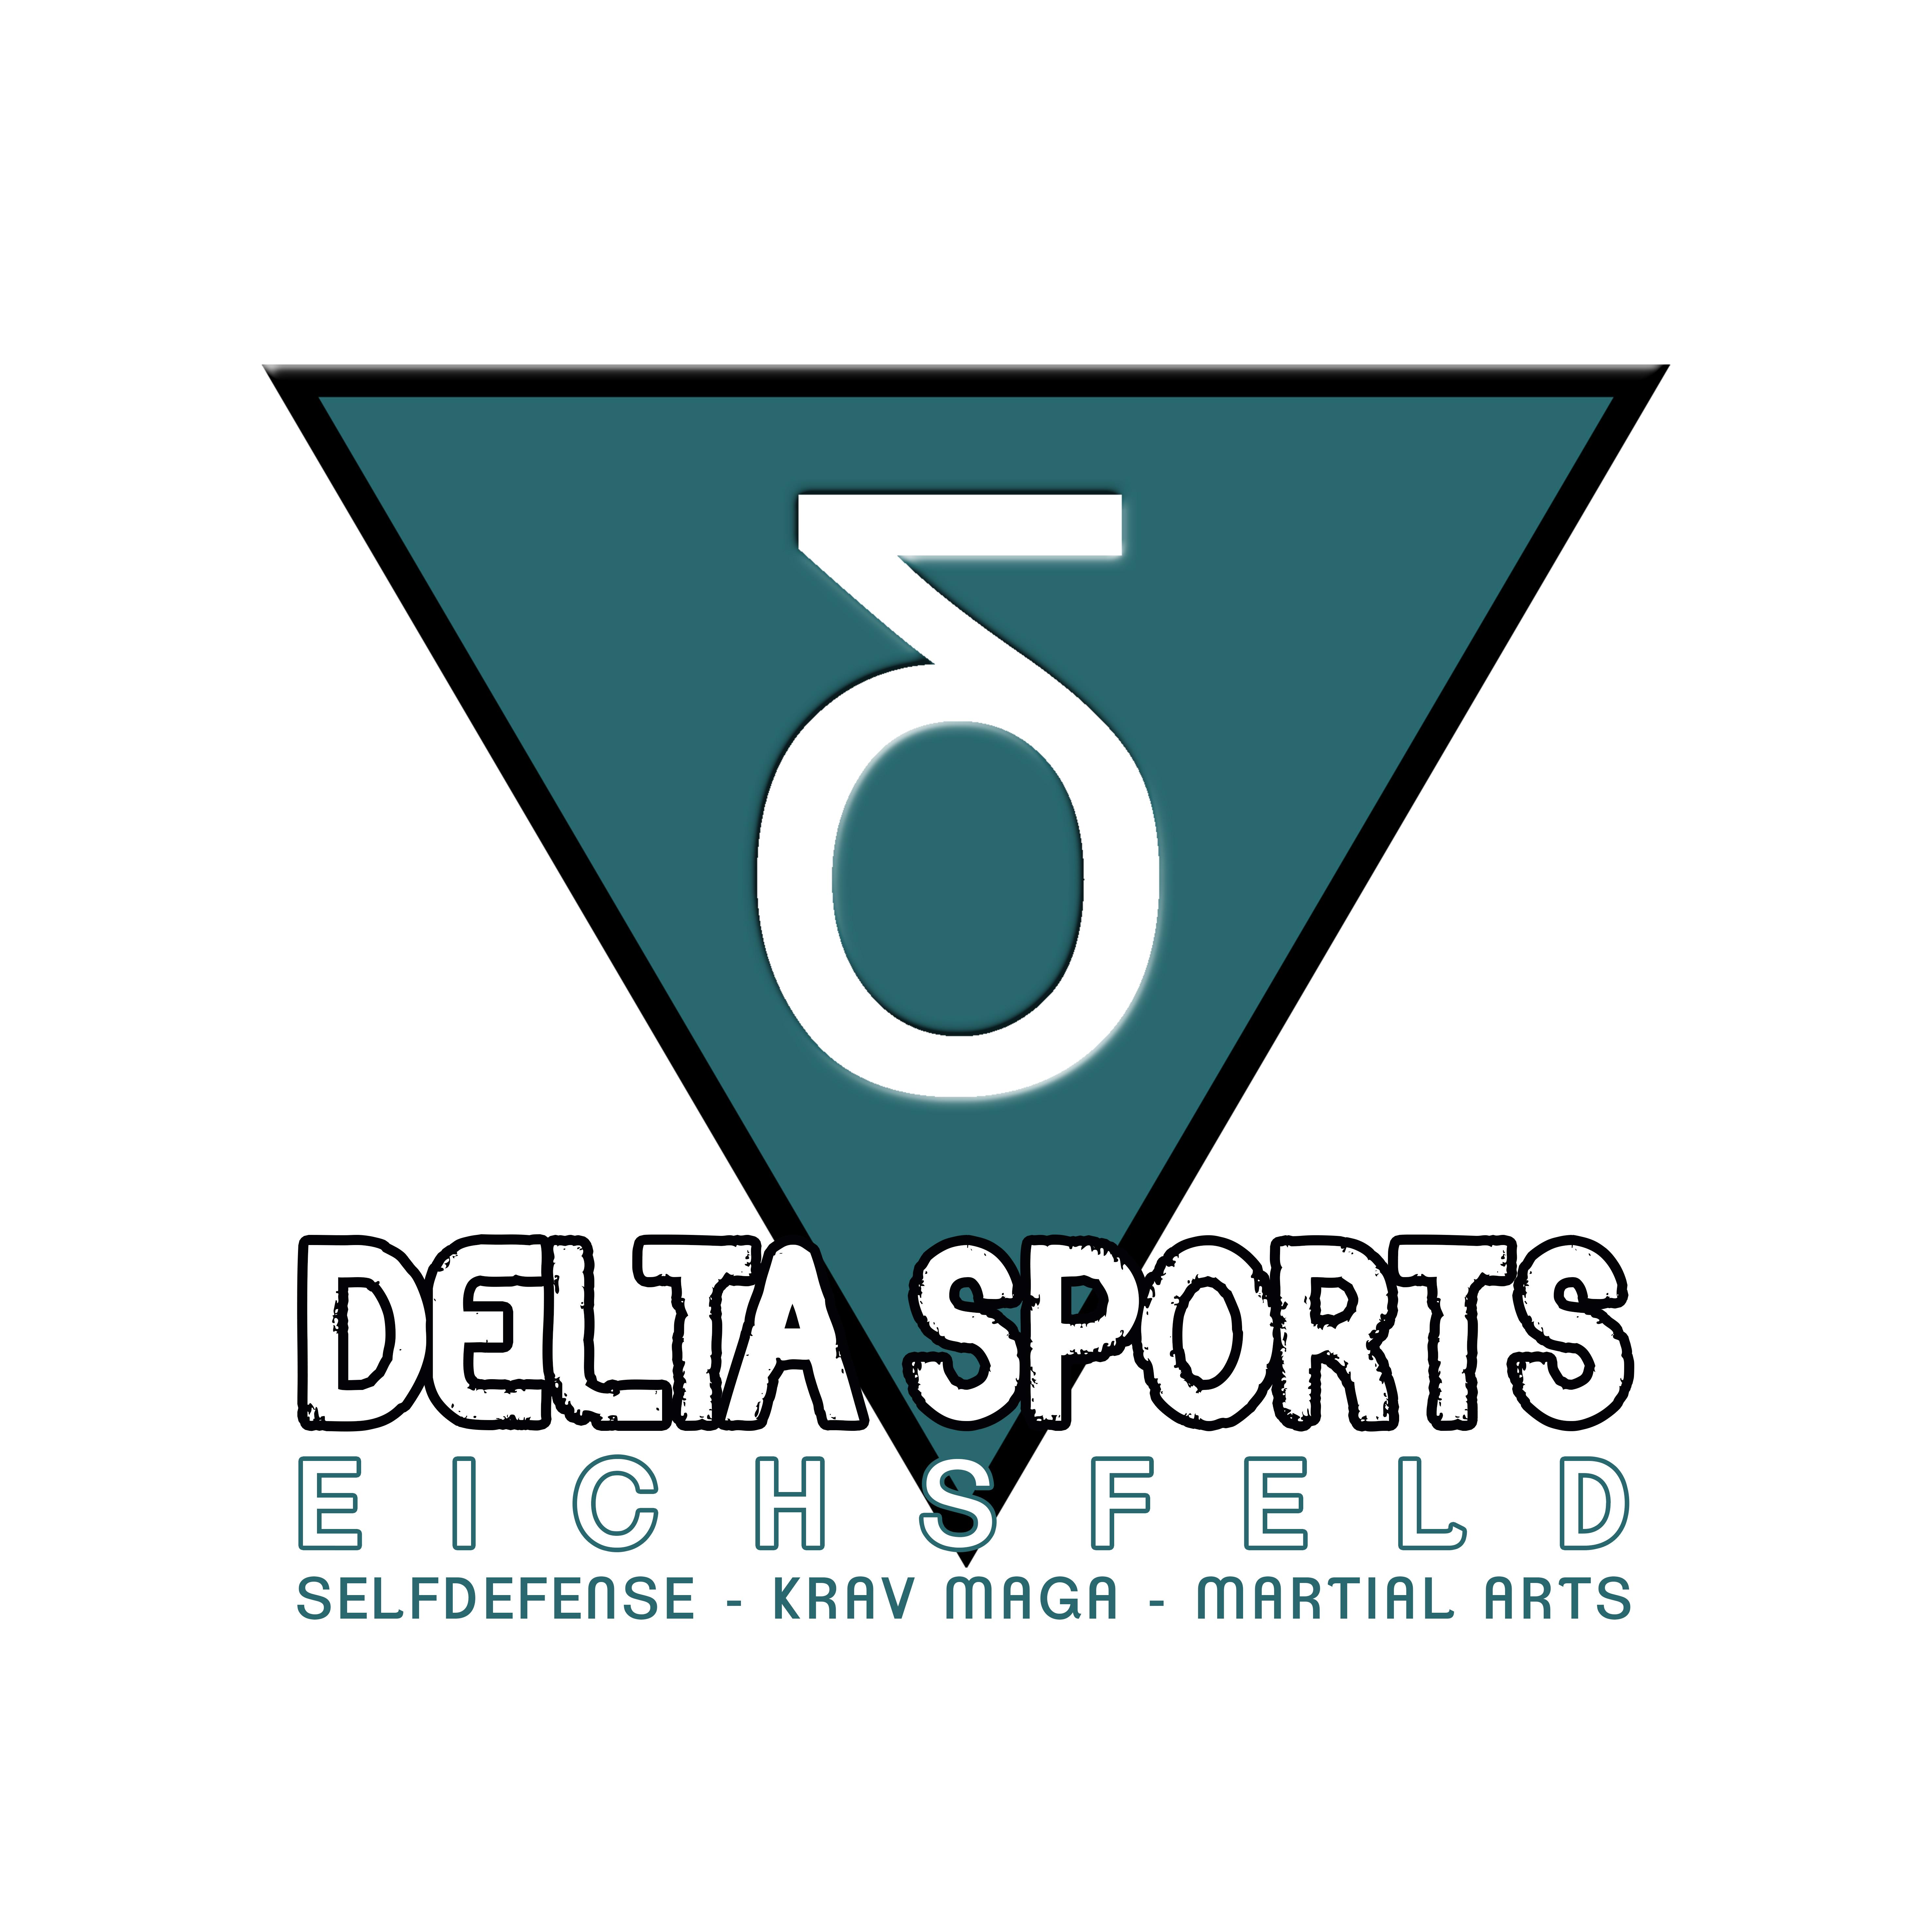 Delta Sports Eichsfeld Logo.jpg